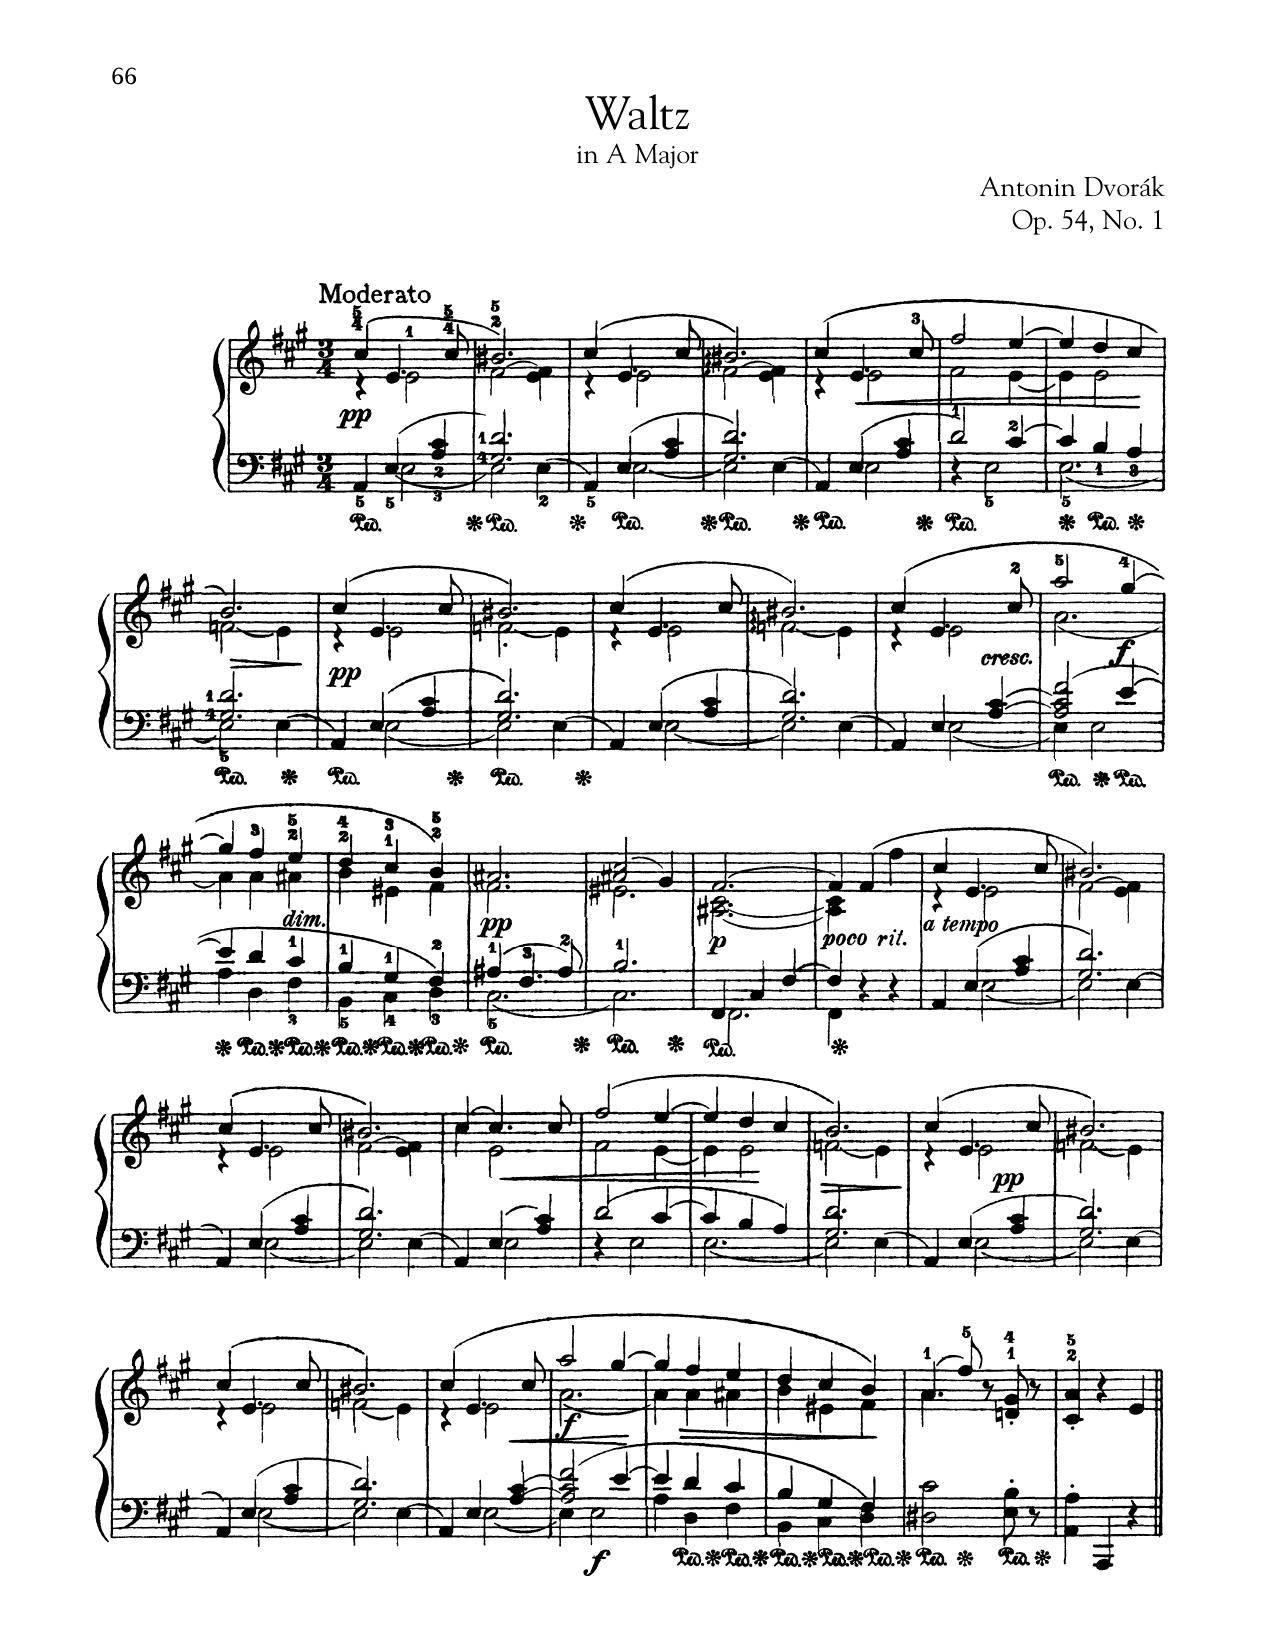 Antonin Dvorak Waltz In A Major, Op. 54, No. 1 sheet music notes and chords. Download Printable PDF.